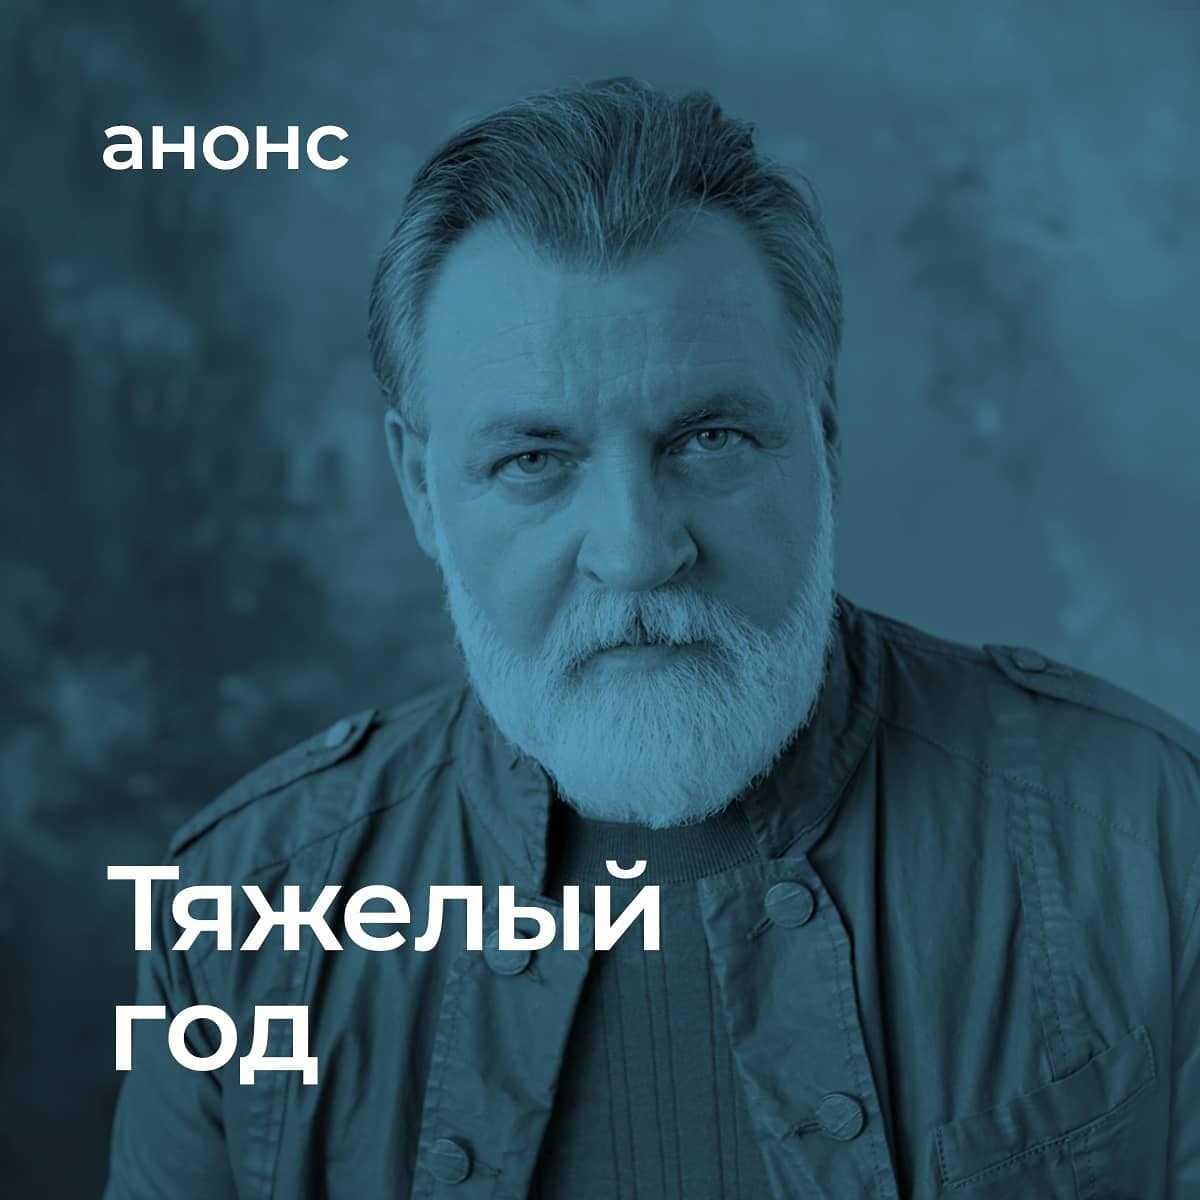 фото из альбома Александра Литвина №8